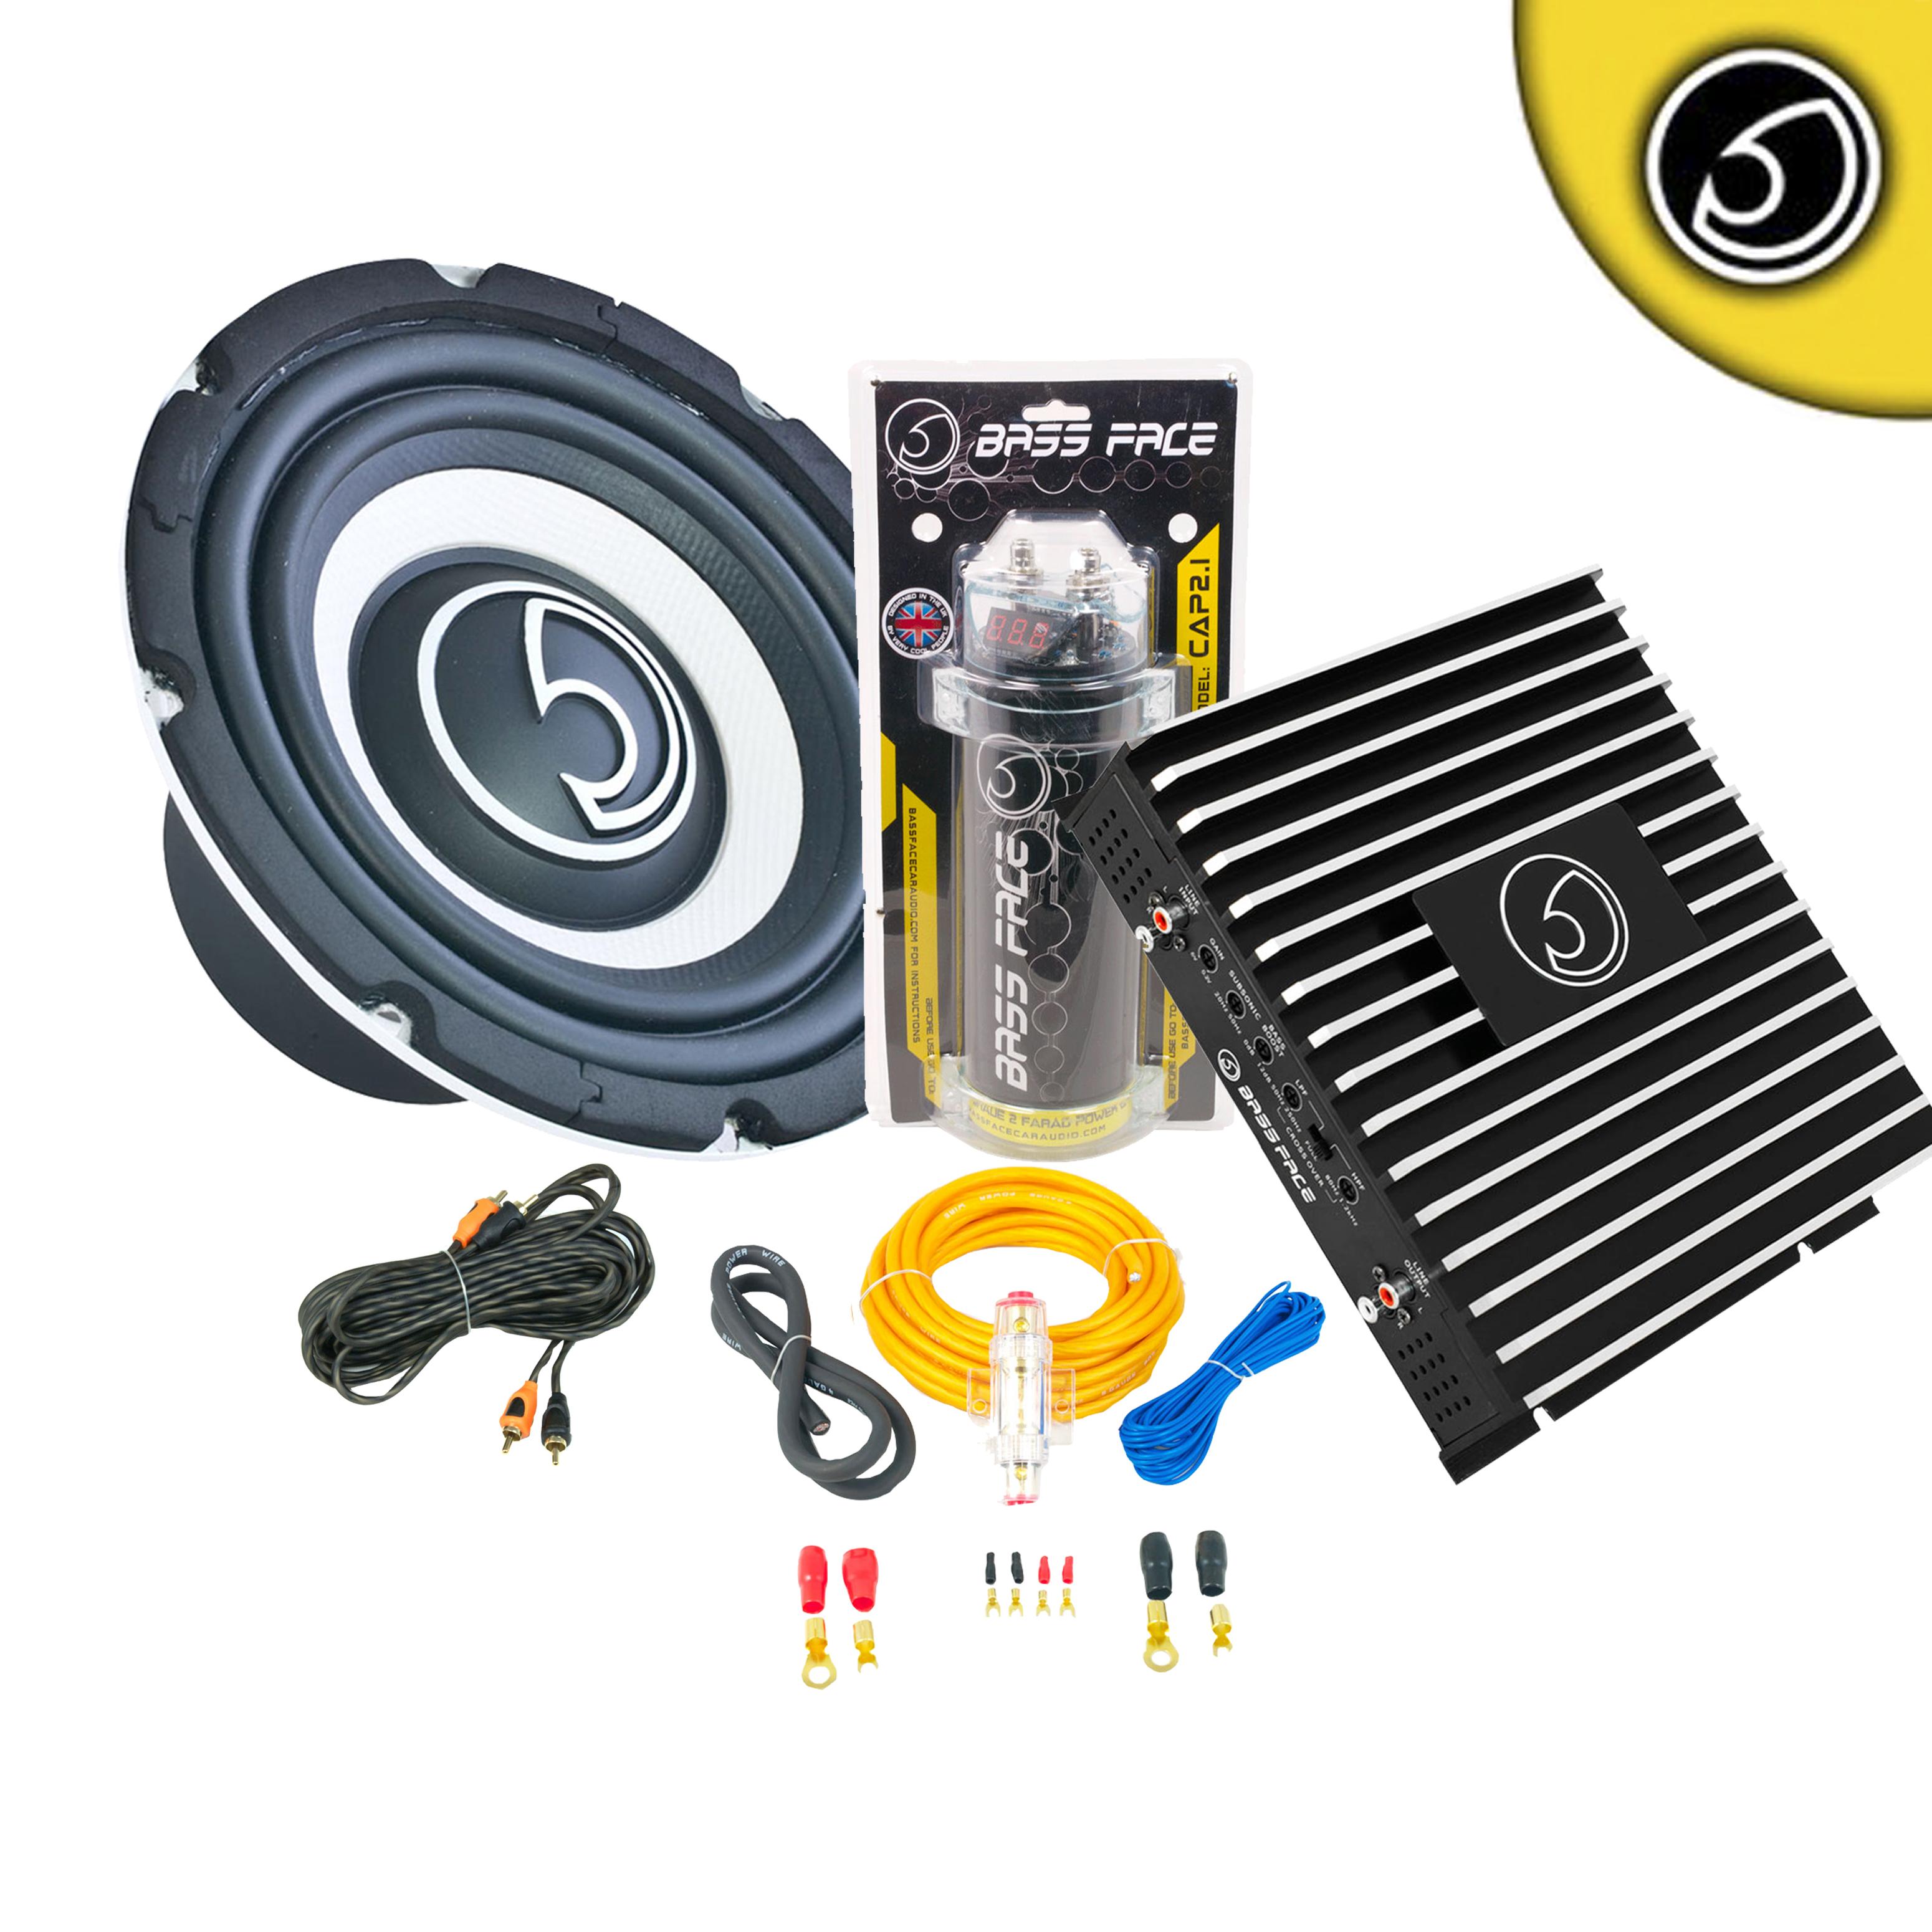 Thompsons Ltd Bassface Spl81 8 Inch 800w Car Audio Sub Subwoofer Edge Amp And Wiring Kit